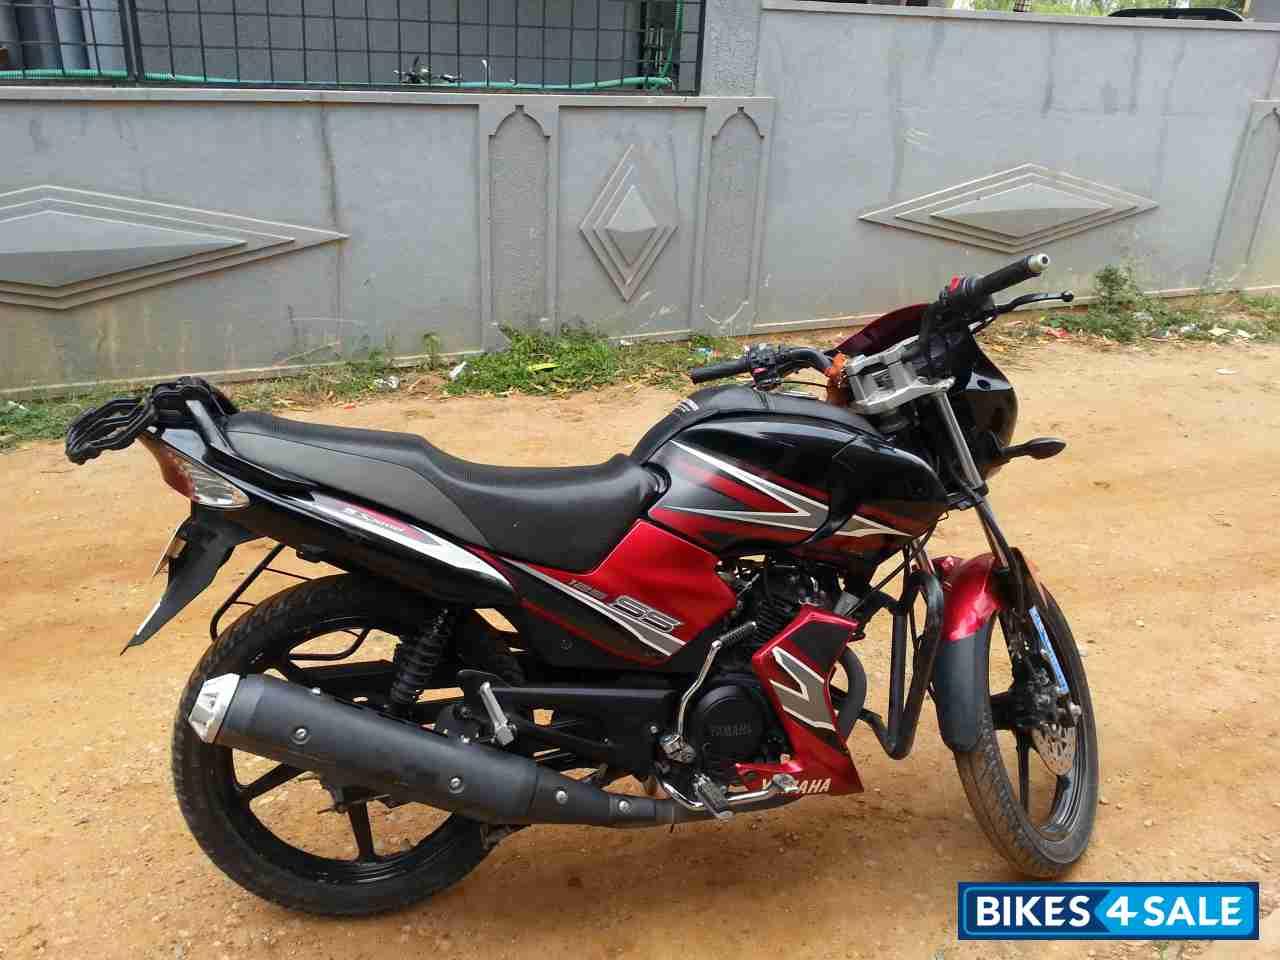 ss125 yamaha price in bangalore dating